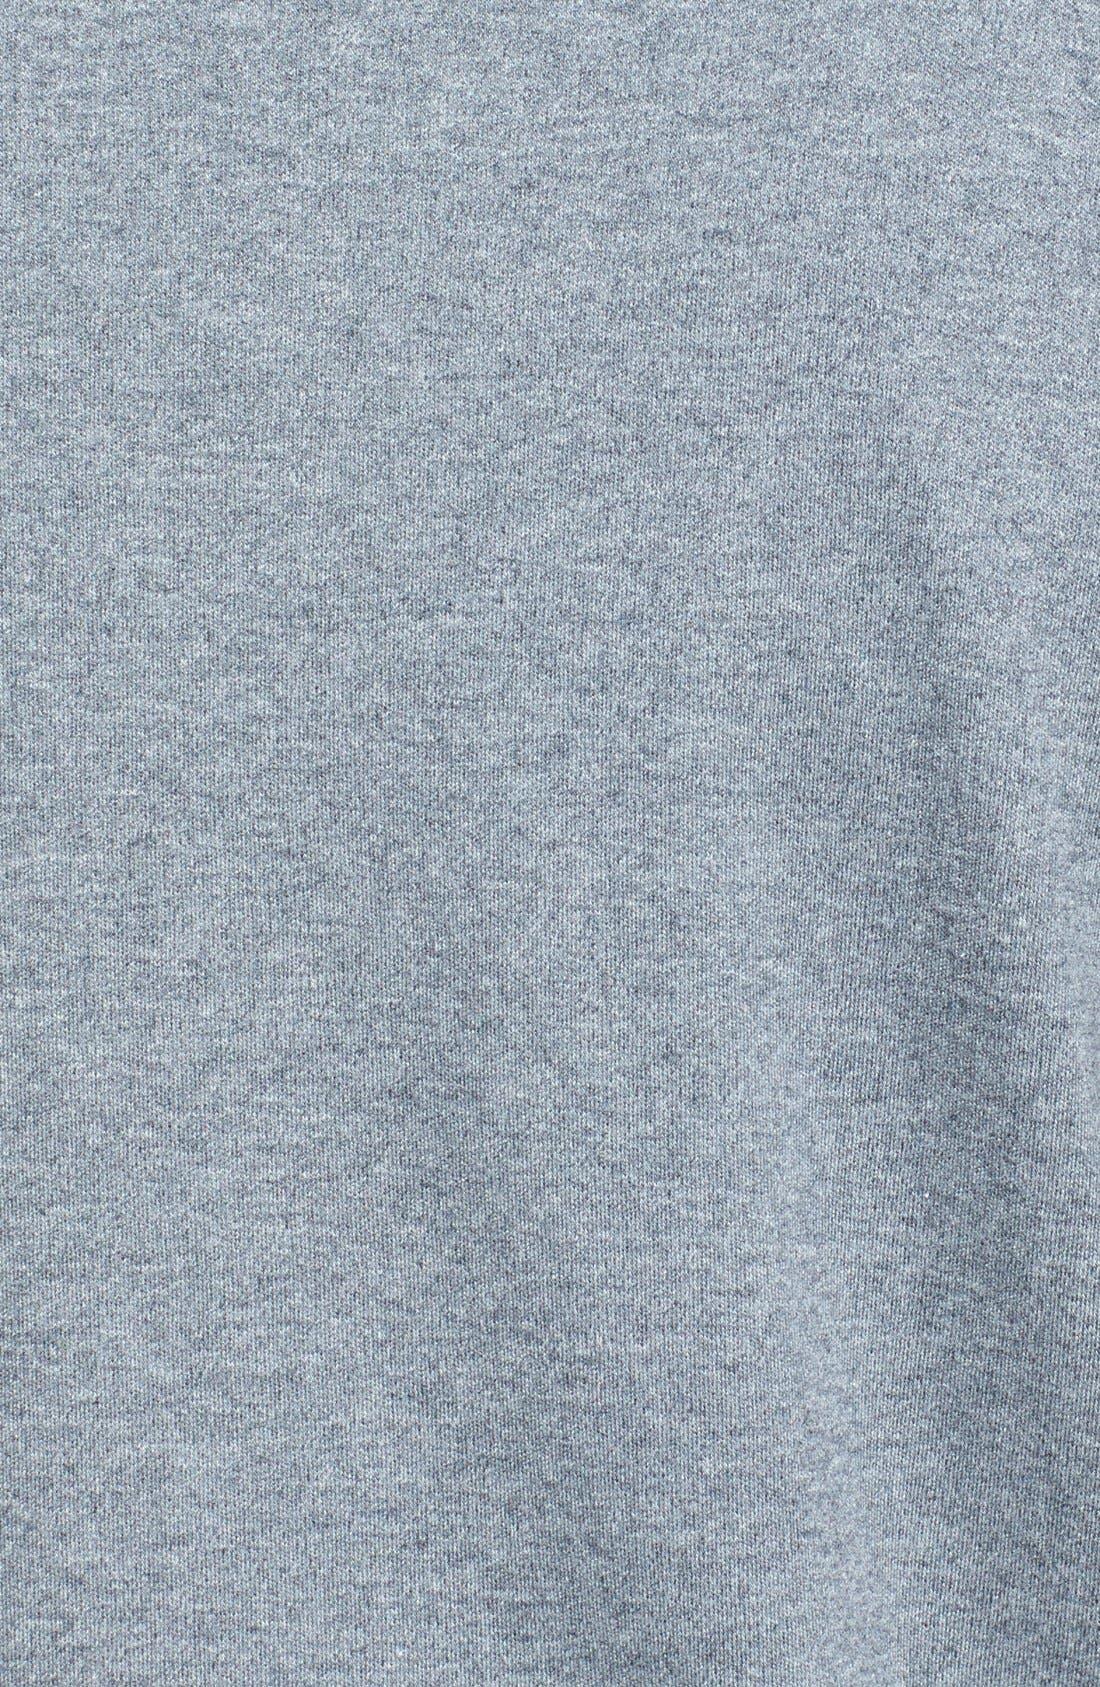 Regular Fit Interlock Knit Polo,                             Alternate thumbnail 3, color,                             GREY CLOUDY HEATHER